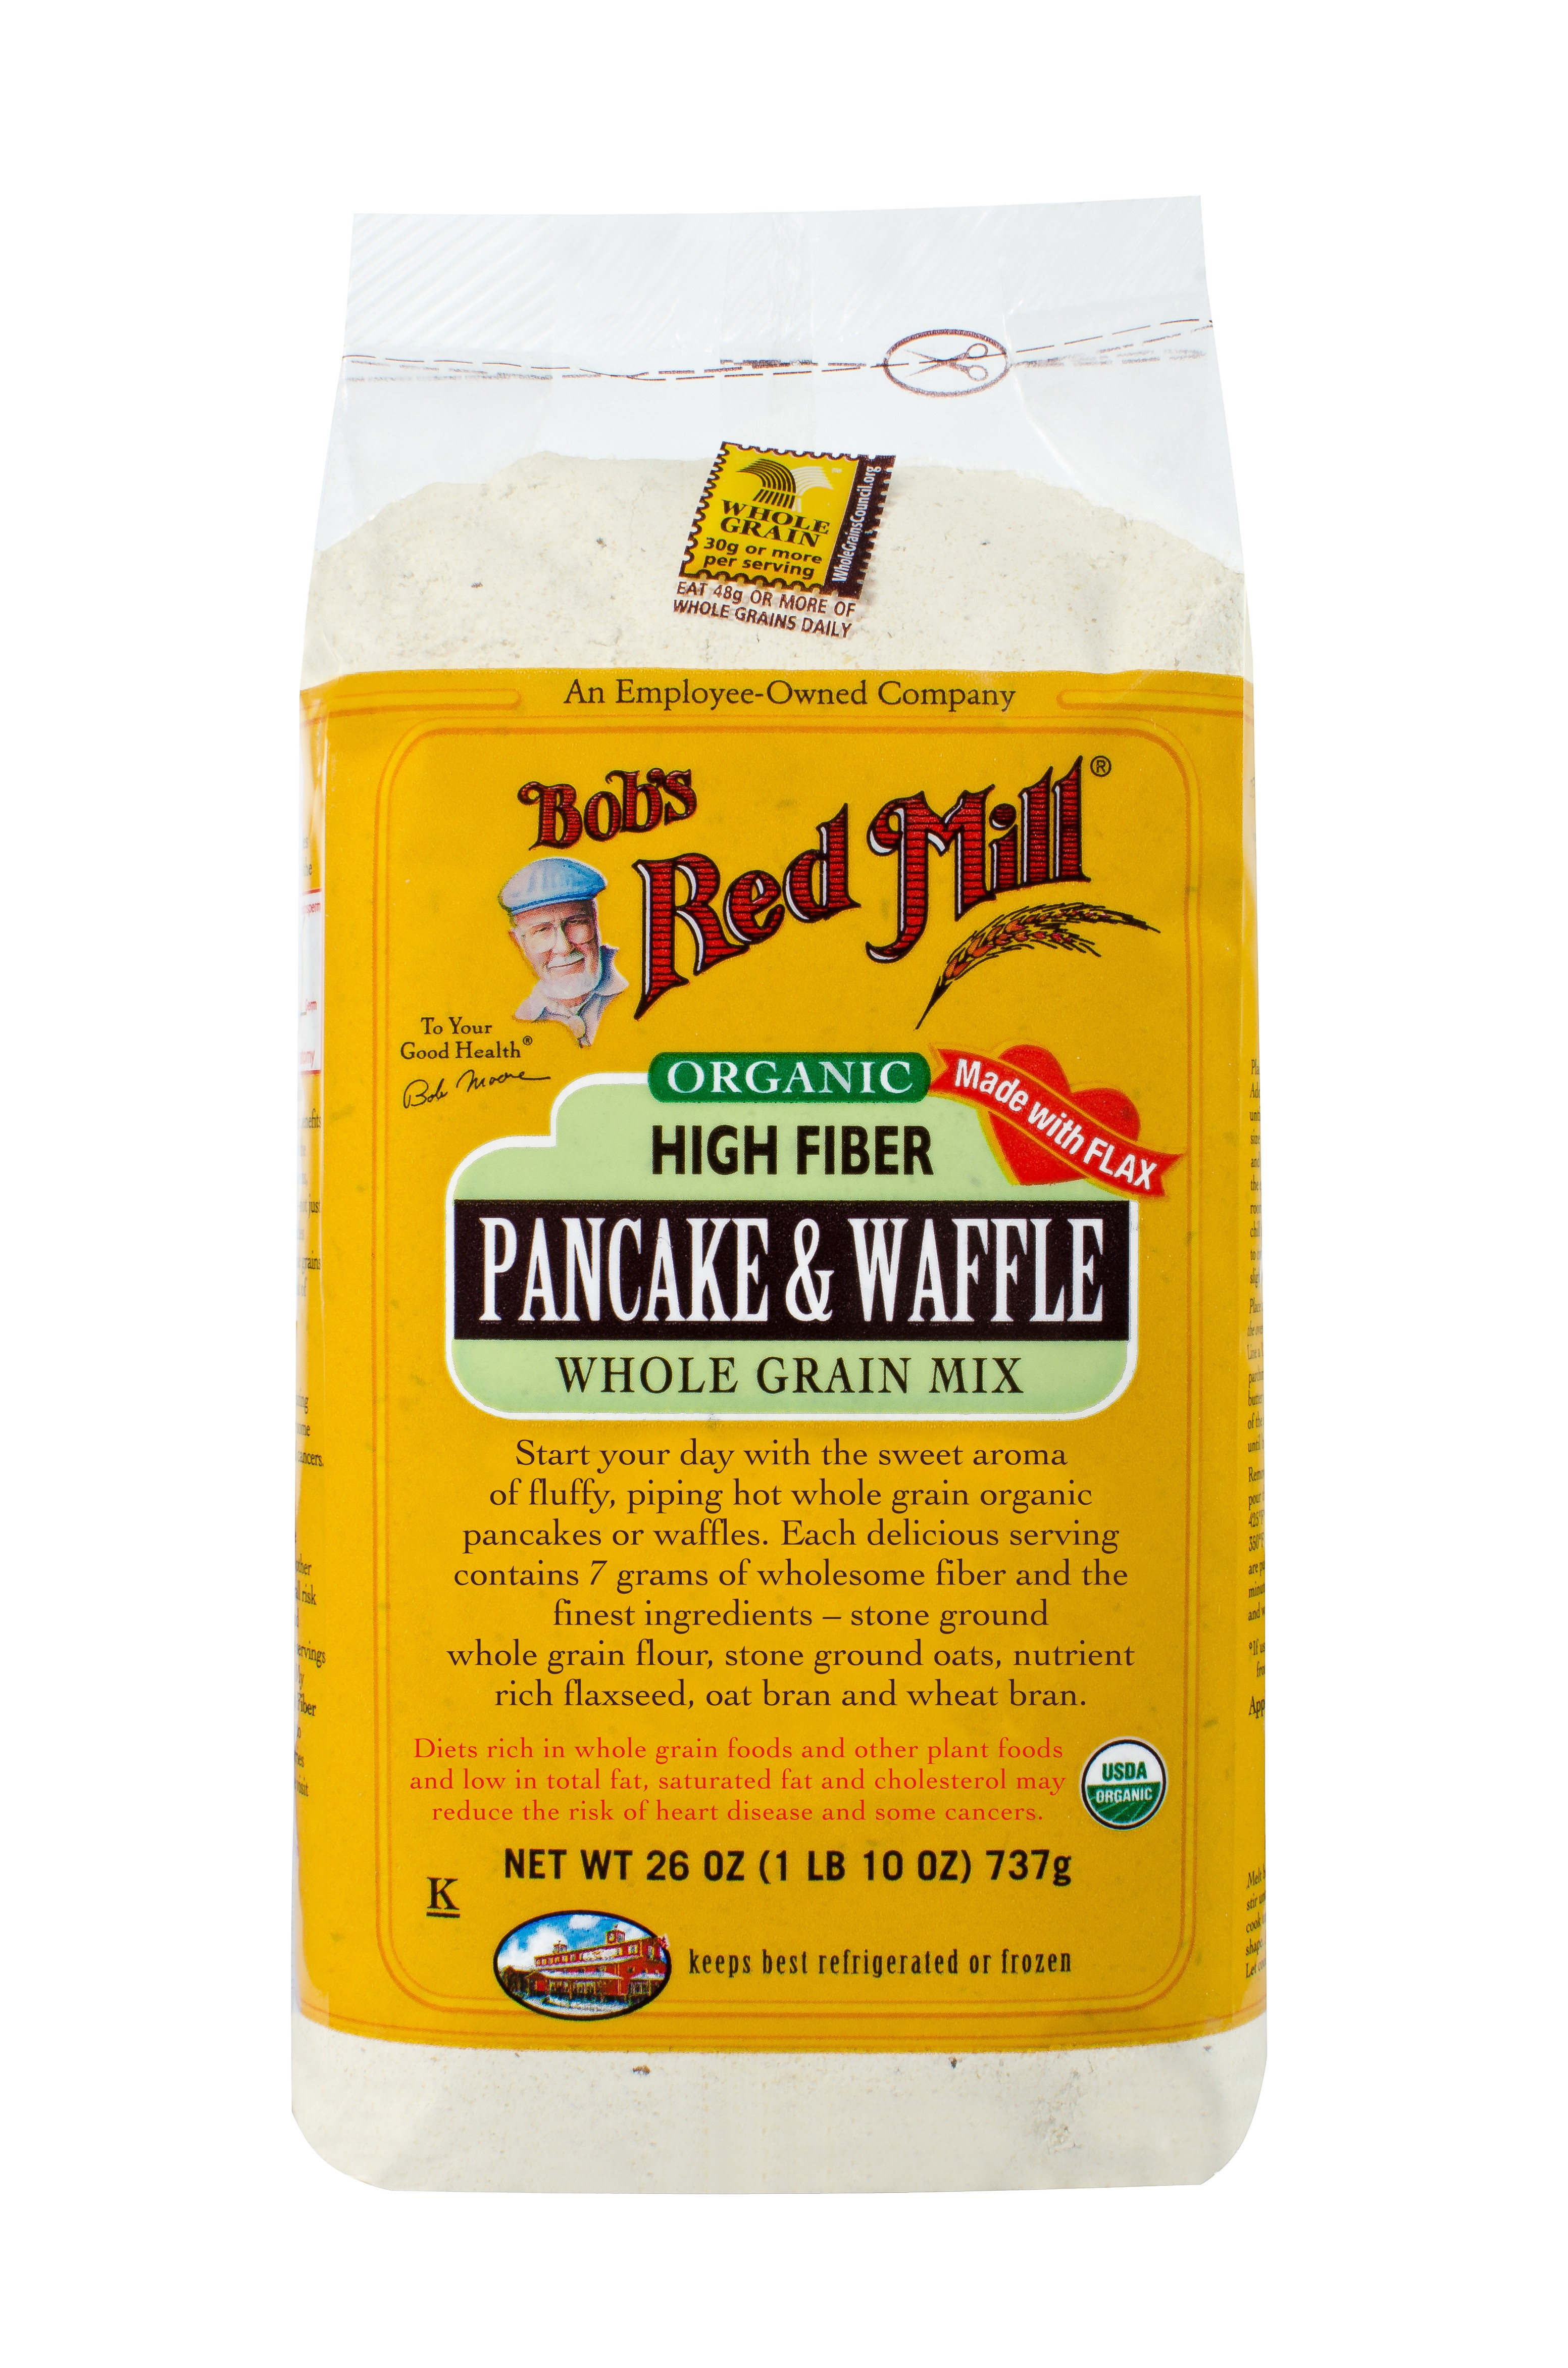 Bobs Red Mill Organic High Fiber Pancake & Waffle Mix, 26 Oz by Bob'S Red Mill